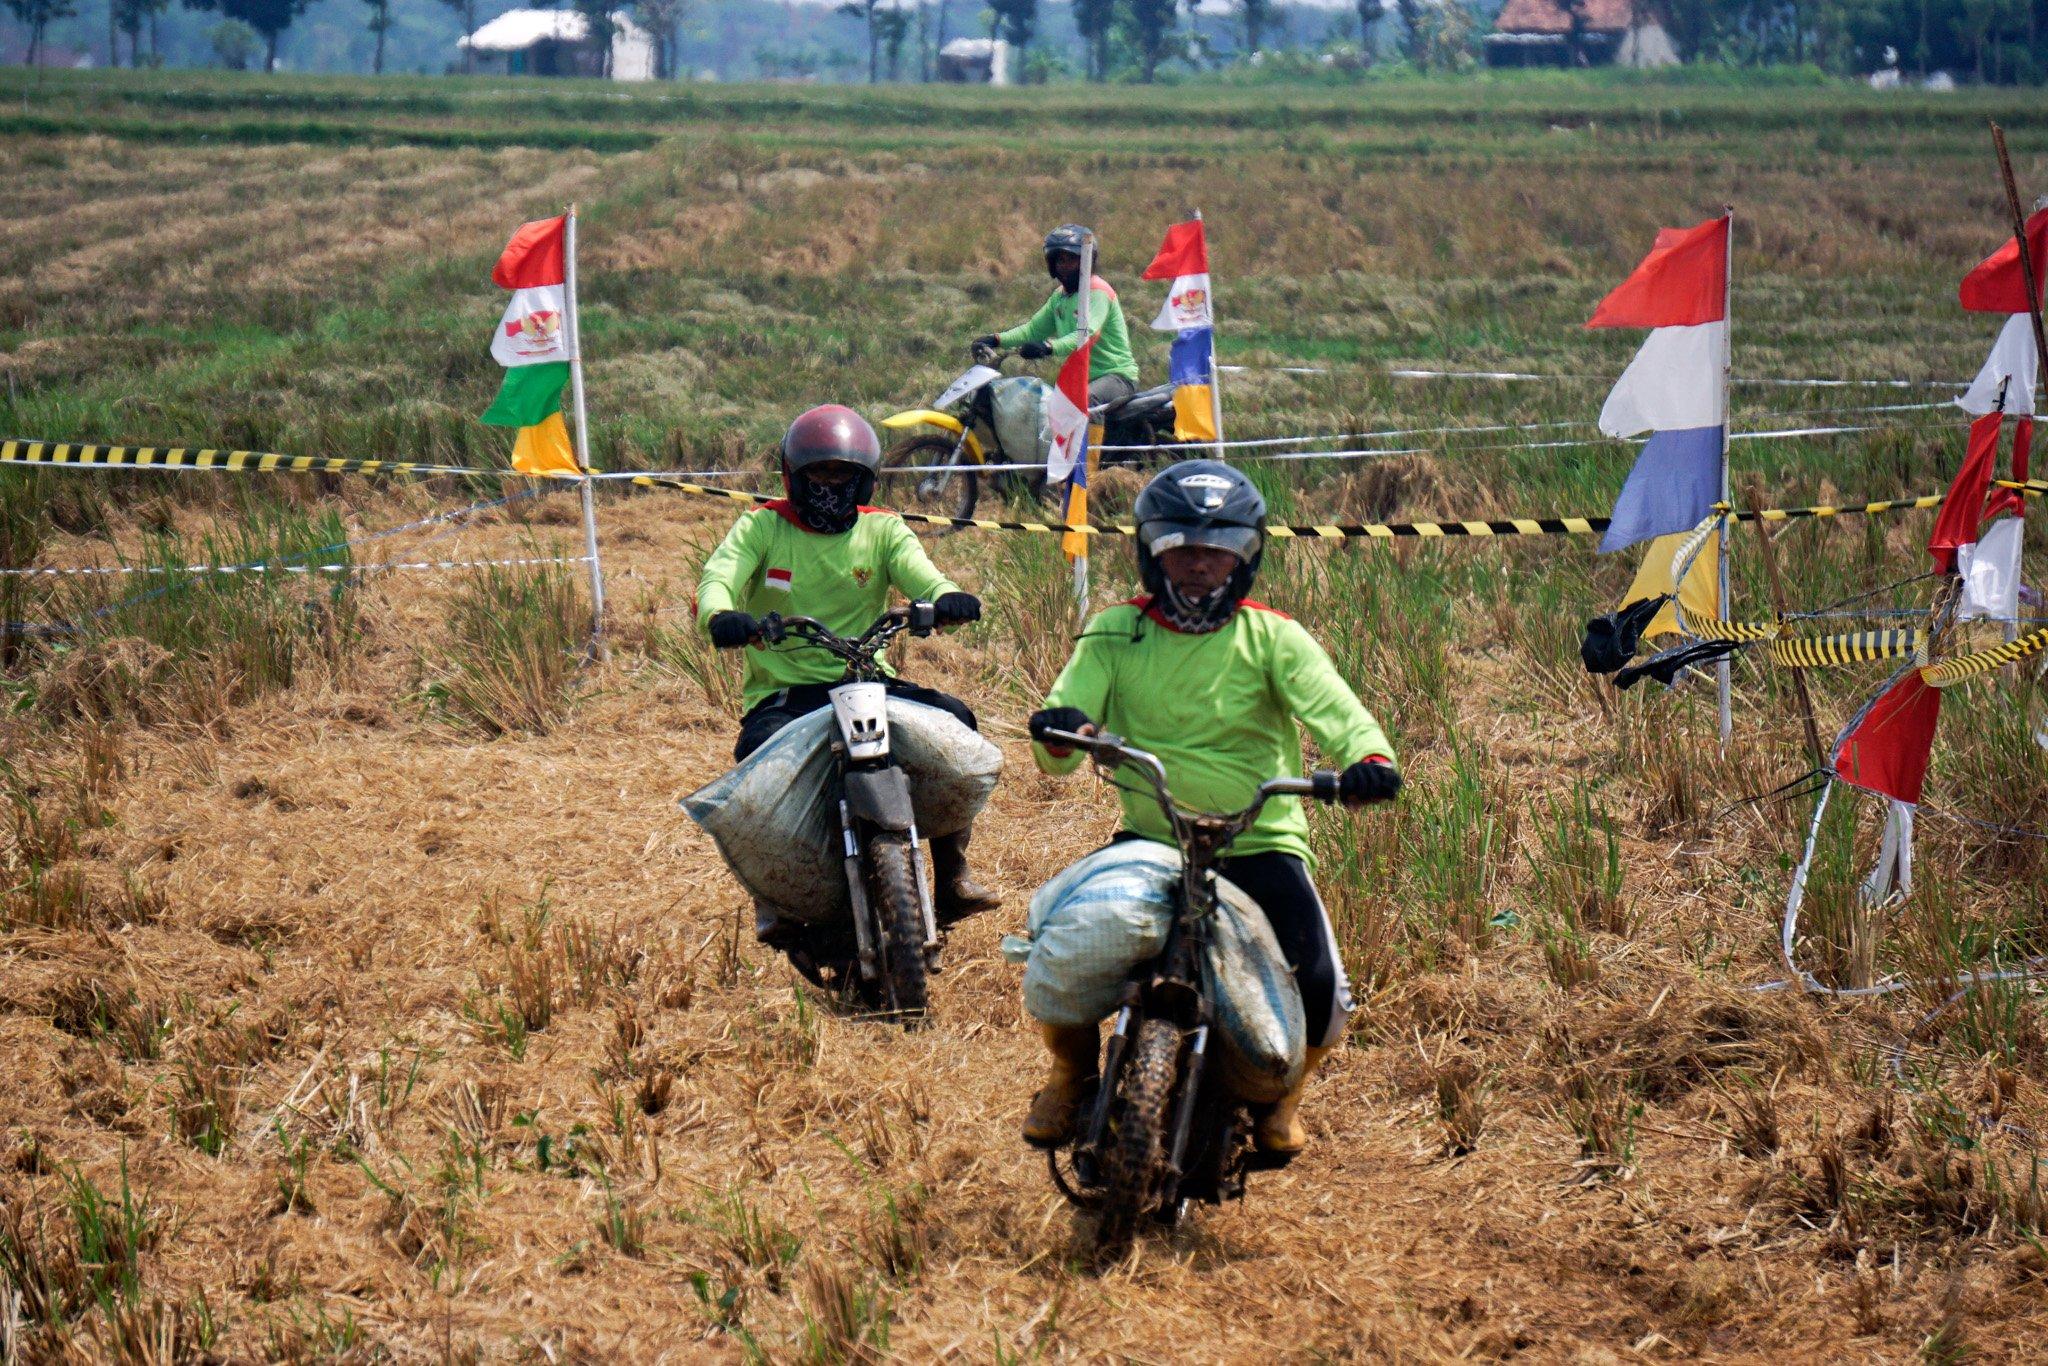 Sejumlah warga mengikuti balap sepeda motor gabah di lahan sawah milik warga di Desa Tegalsari, Kandeman, Kabupaten Batang, Jawa Tengah, Minggu (12/9/2021). Lomba balap sepeda motor gabah yang diikuti oleh 30 warga yang berprofesi sebagai ojek gabah itu dalam rangka syukur atas hasil panen padi yang melimpah. ANTARA FOTO/Harviyan Perdana Putra/wsj.